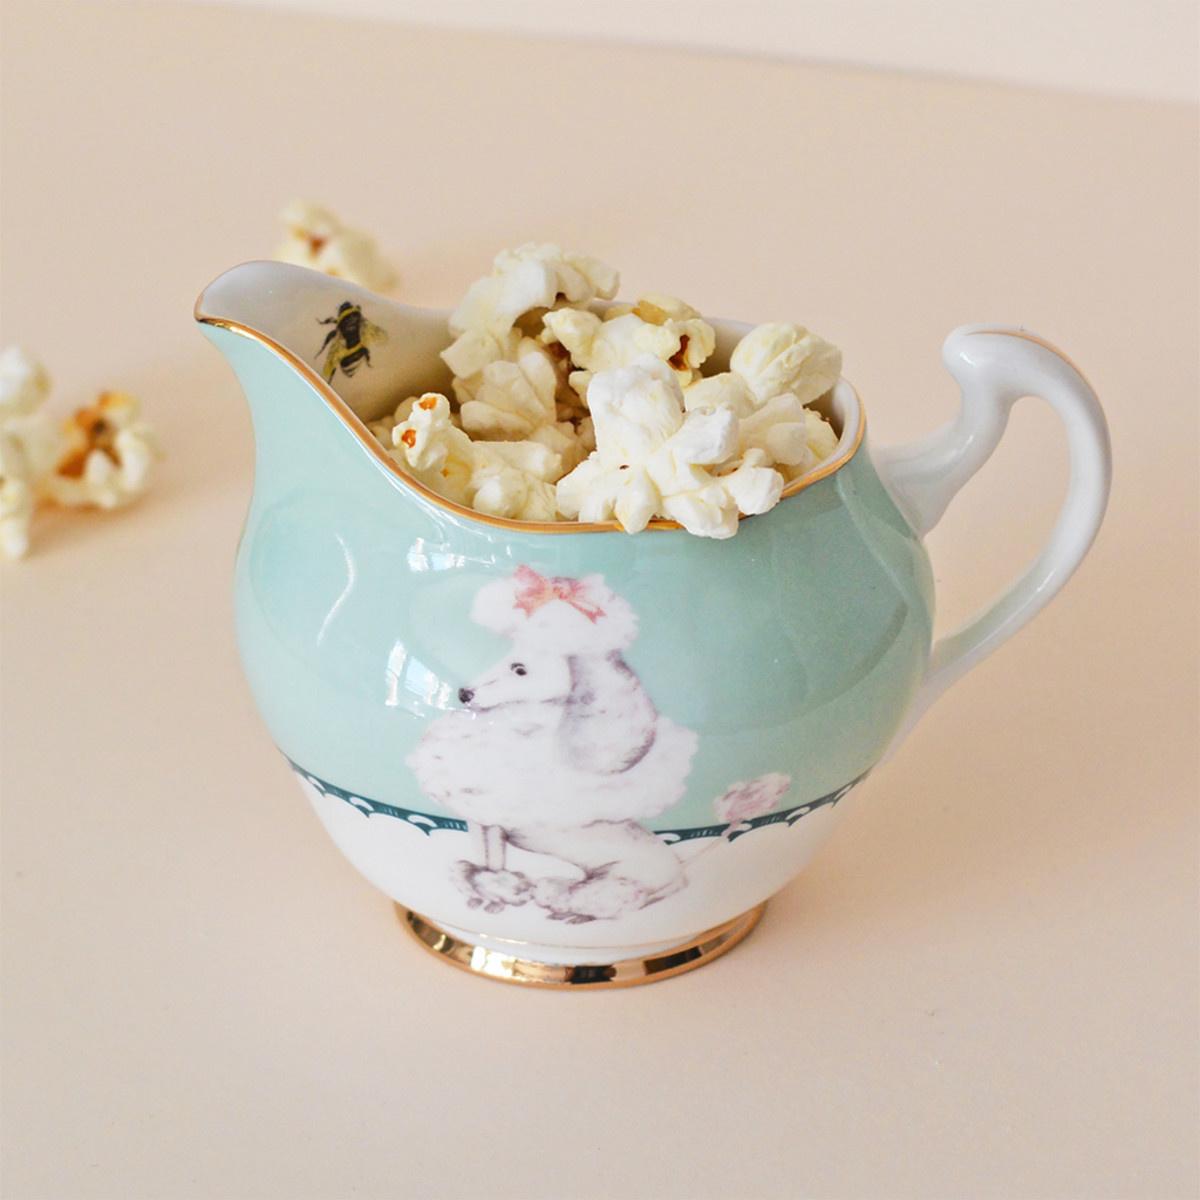 Yvonne Ellen London Yvonne Ellen - Carnival Animal  - Cream Jug - Poodle - Bone China Porcelaine